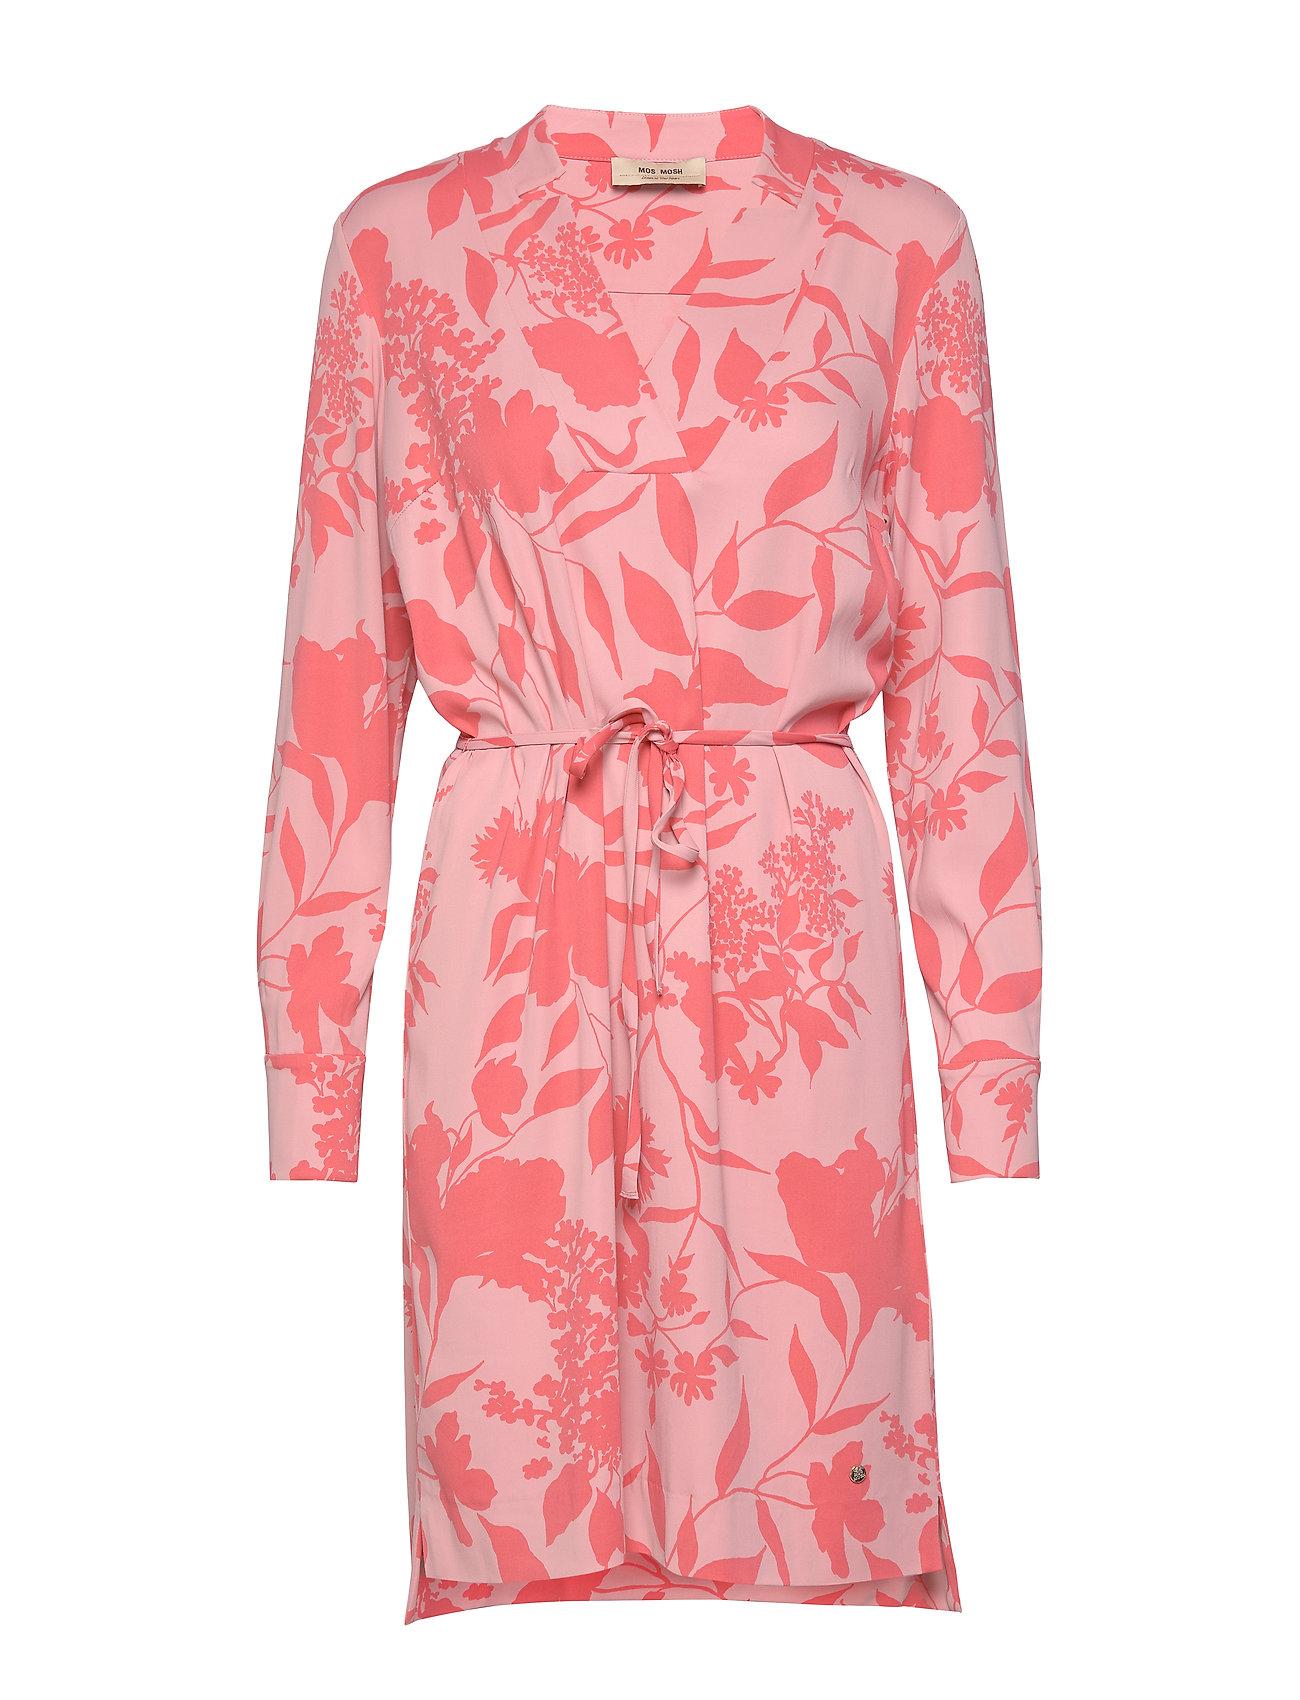 MOS MOSH Lipa Stencil Dress - SUGAR CORAL